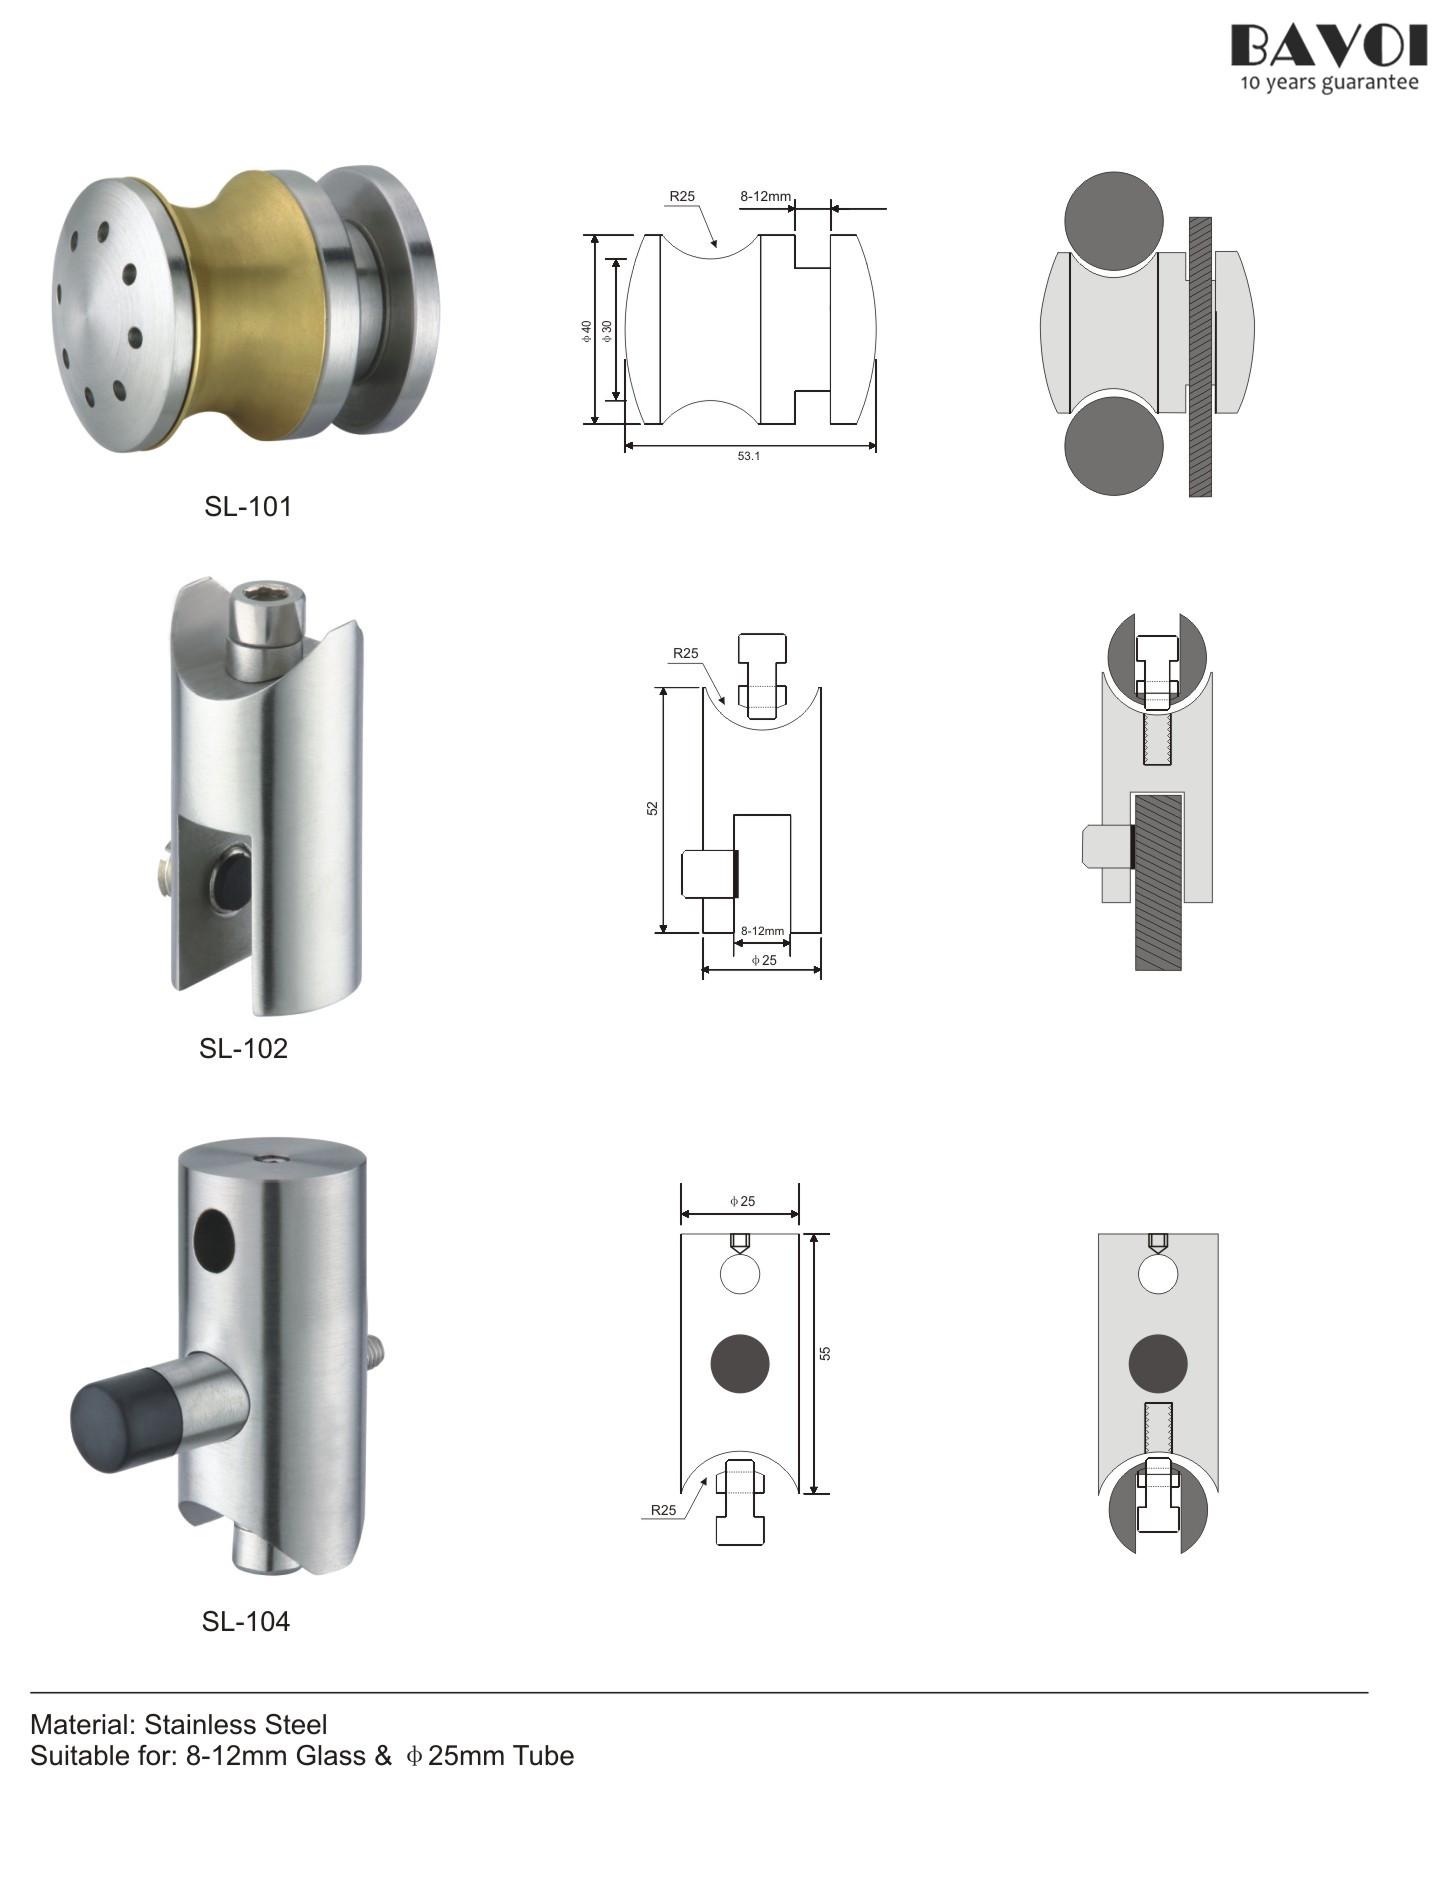 wheel shower sliding system rolling parts manufacture r sl 101 sl 102